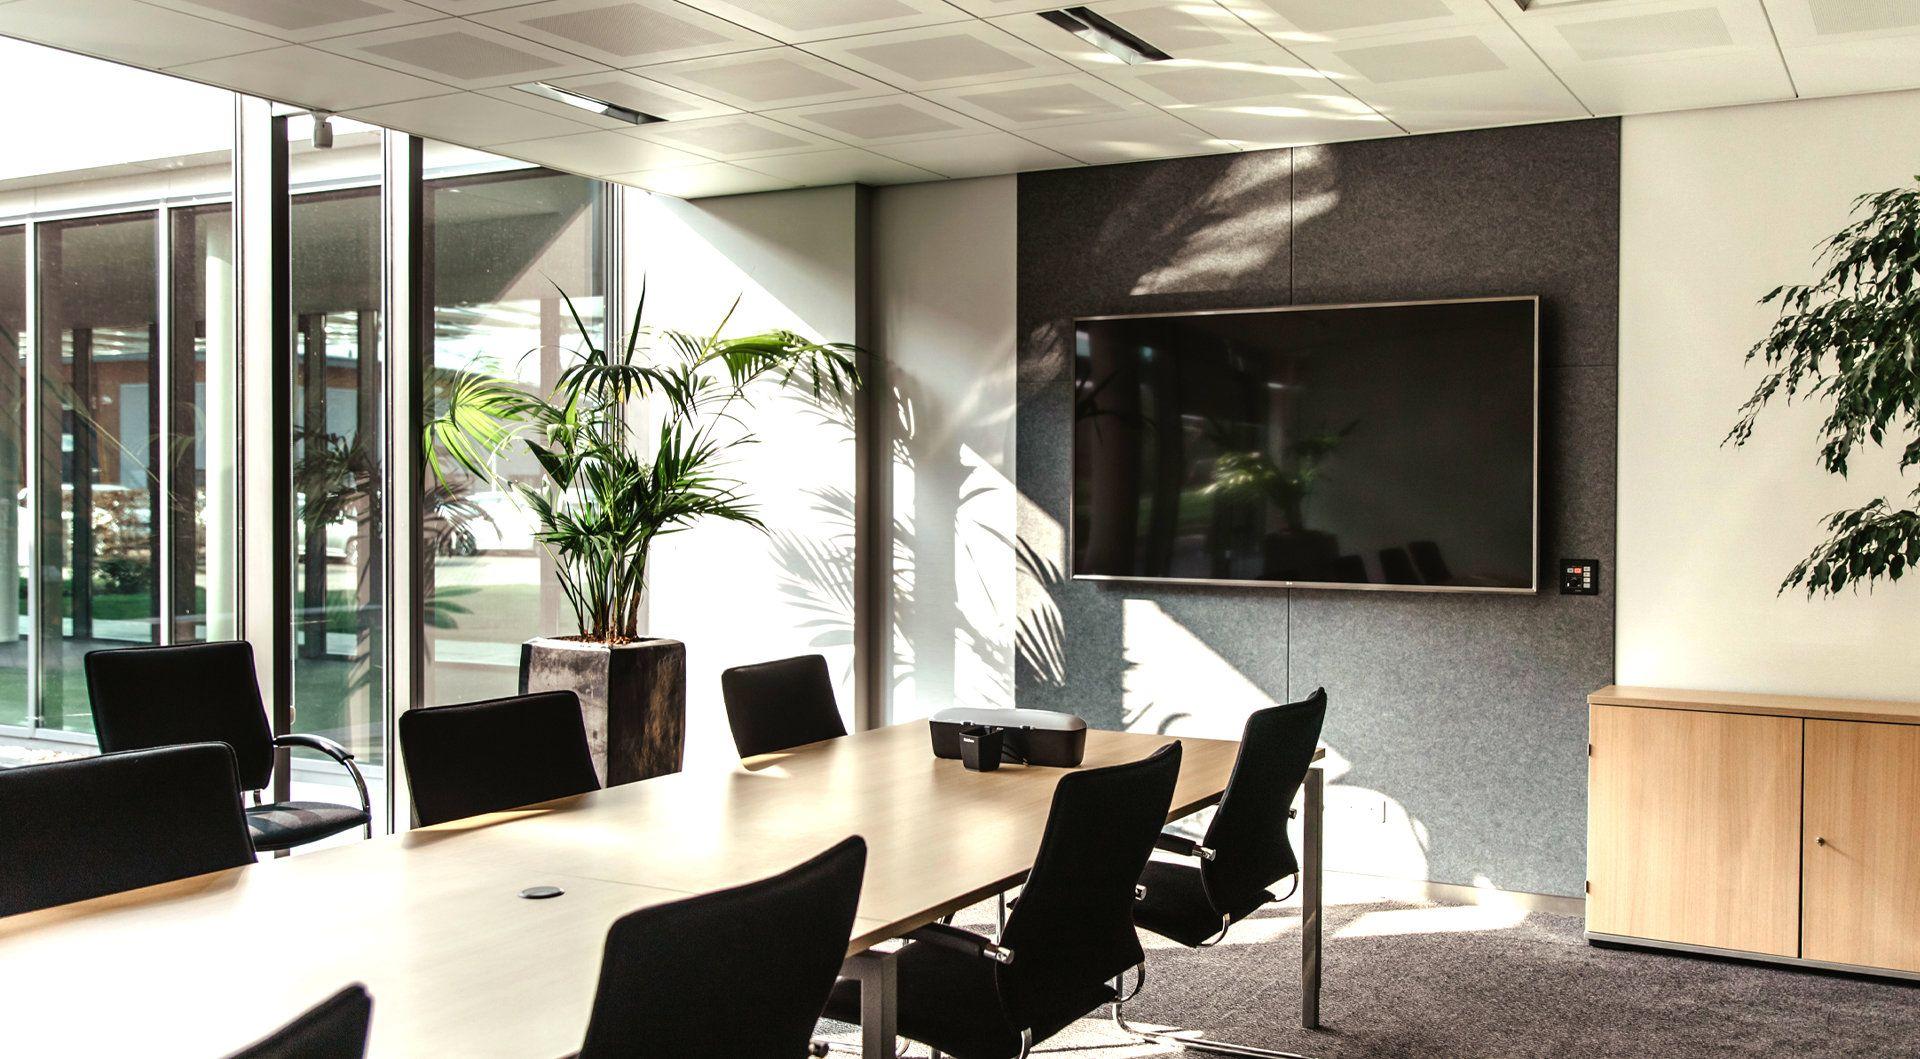 "LG 24MK600M-B LED display 60,5 cm (23.8"") 1920 x 1080 Pixels Full HD Zwart - Case studie de vries"